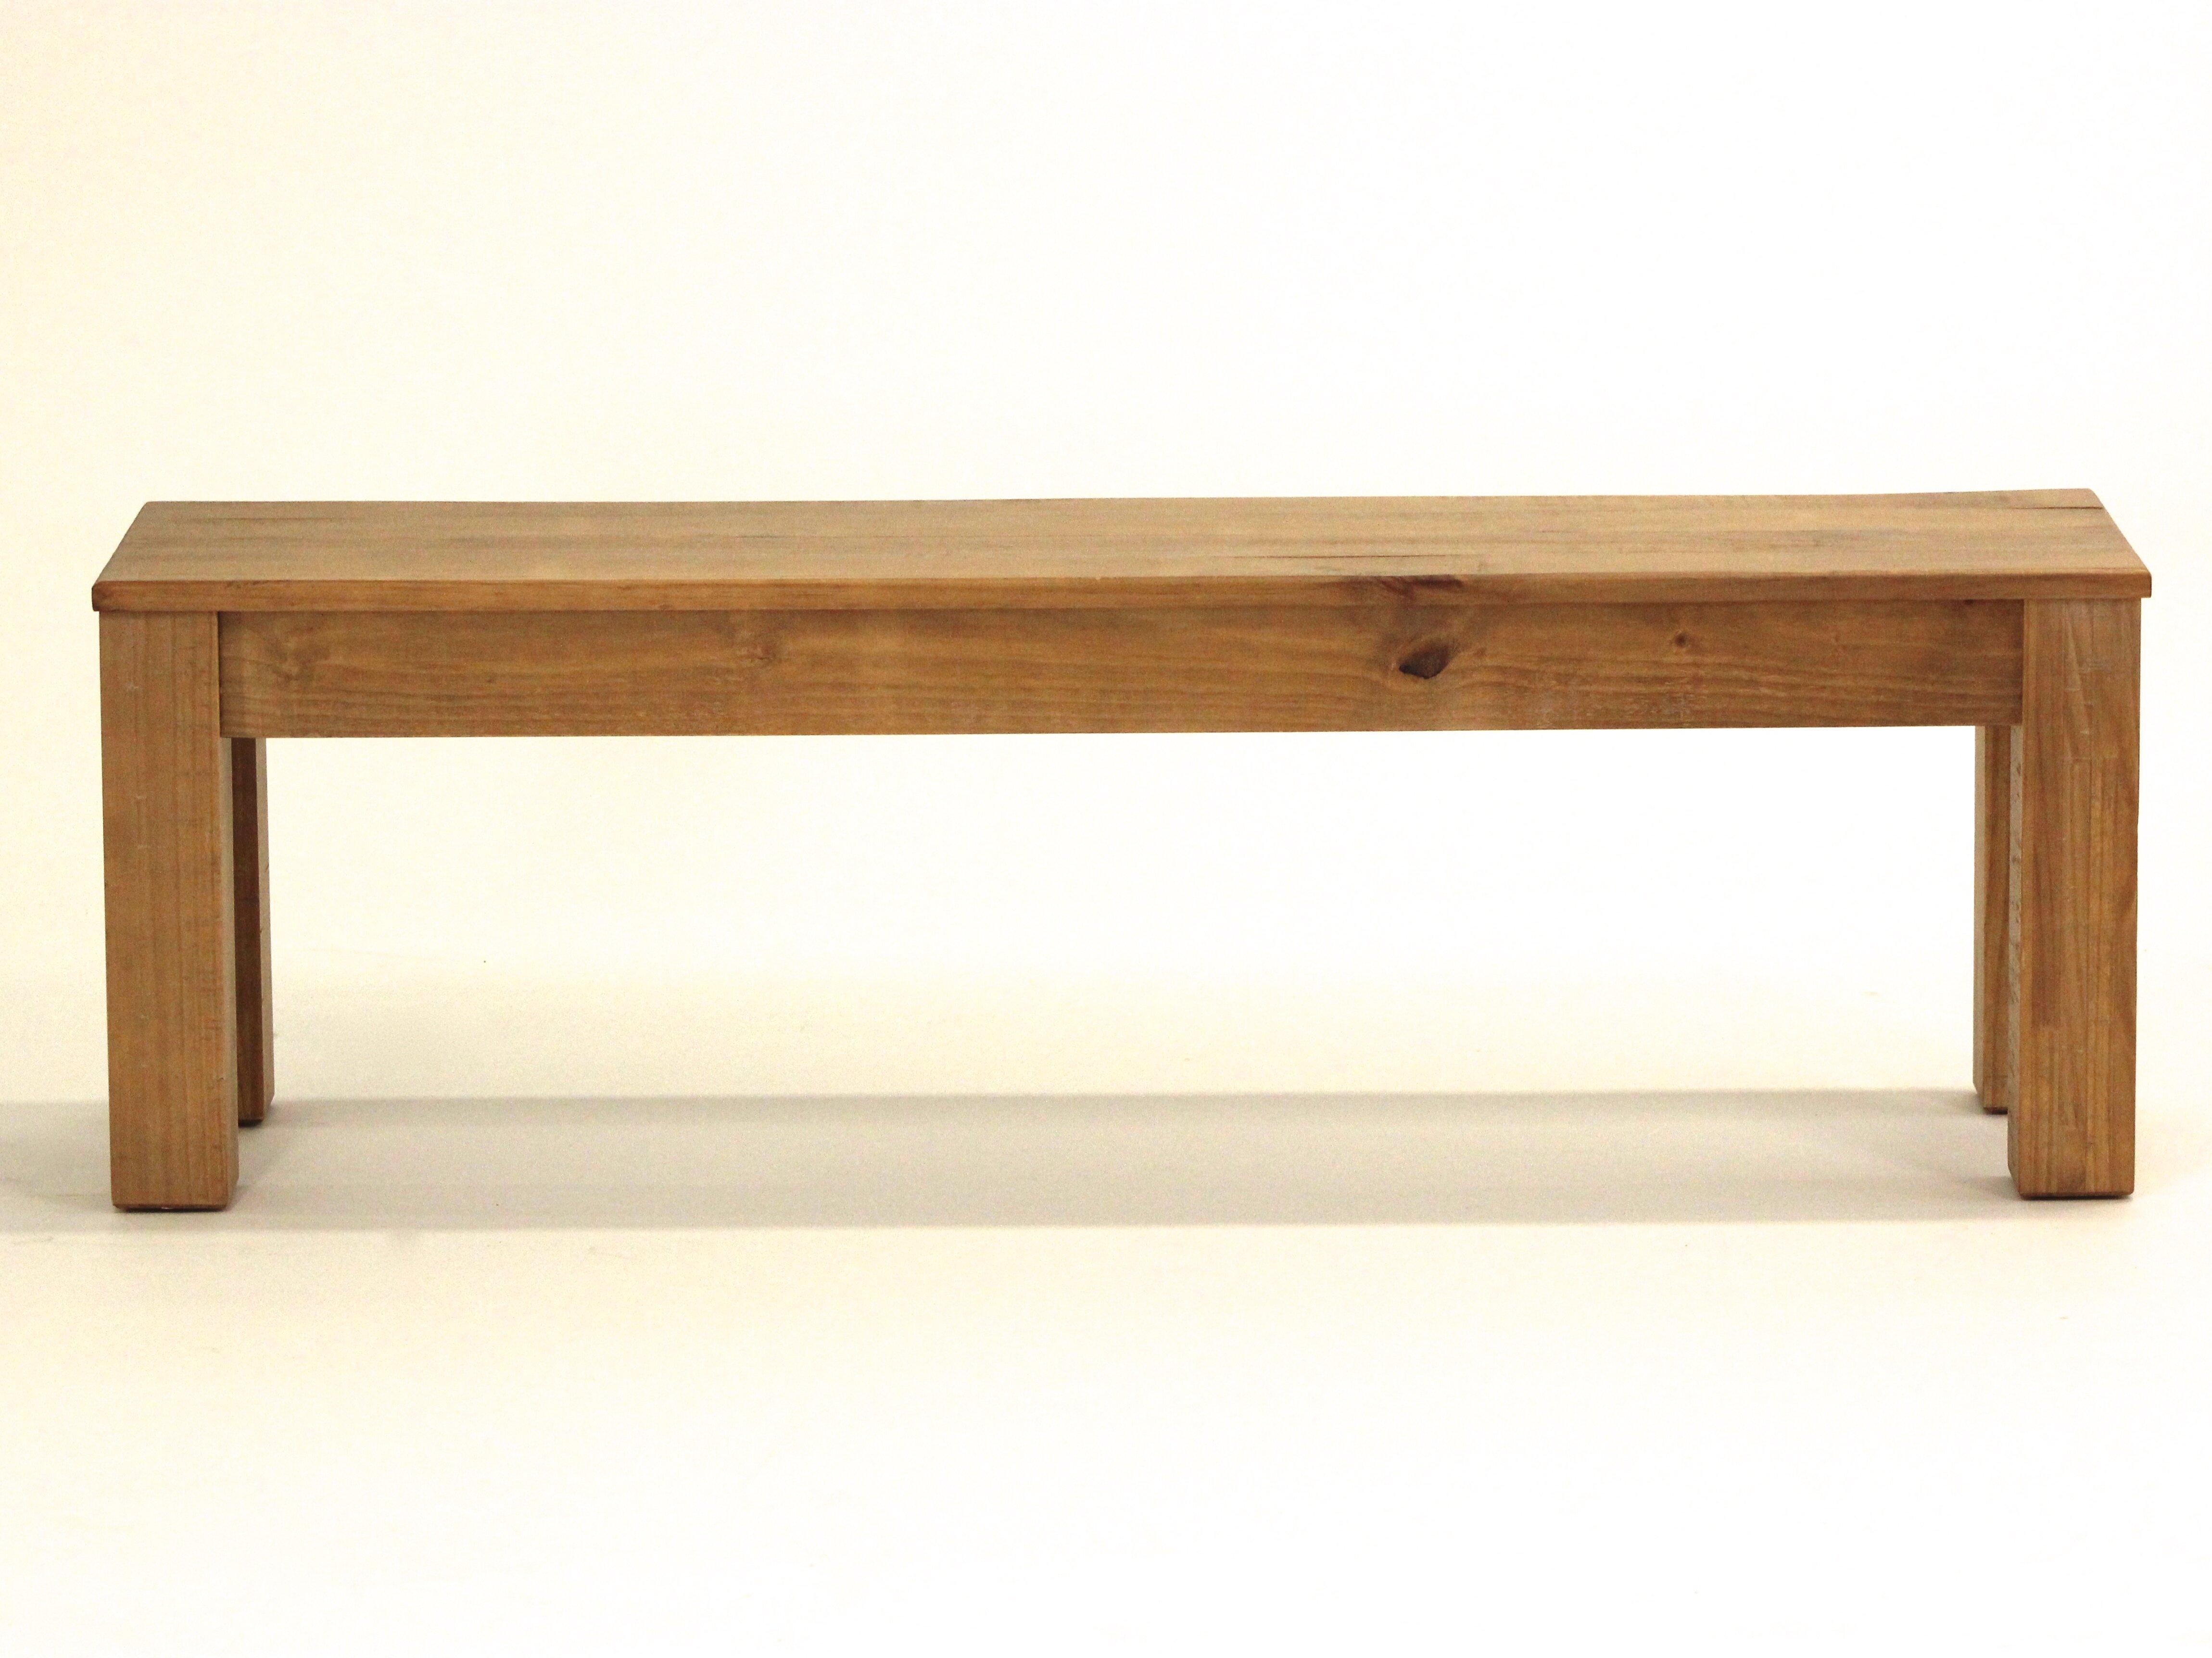 langer naturholzmöbel küchenbank canela aus holz | wayfair.de